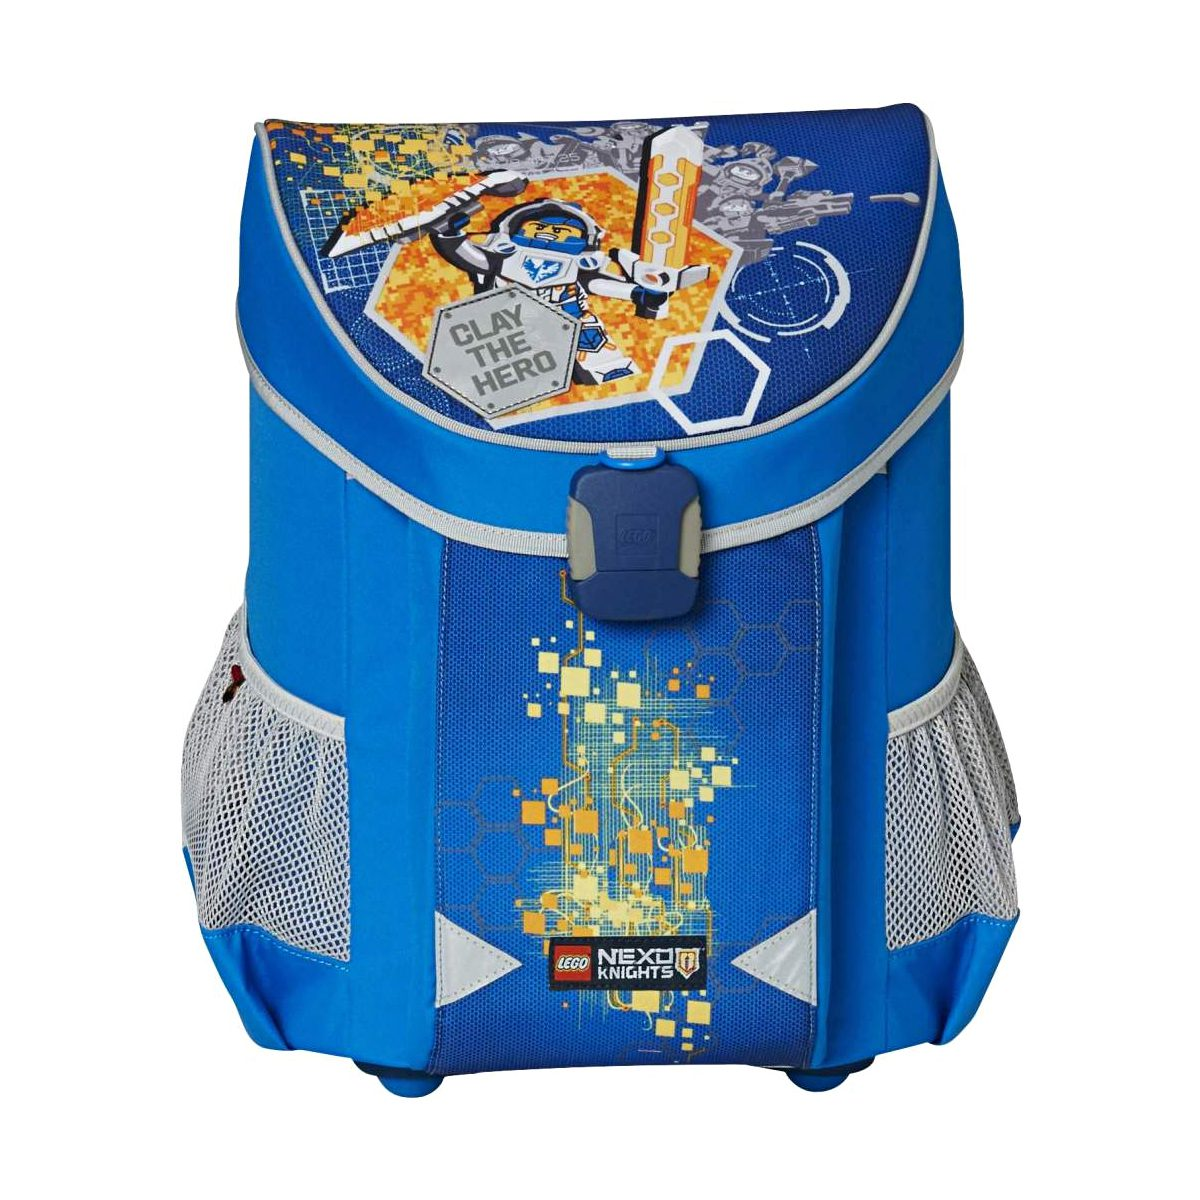 Ghiozdan Pentru Şcoală, Nexo Knights, Easy, Core Line, Bleu, Lego, LG-20043-1708